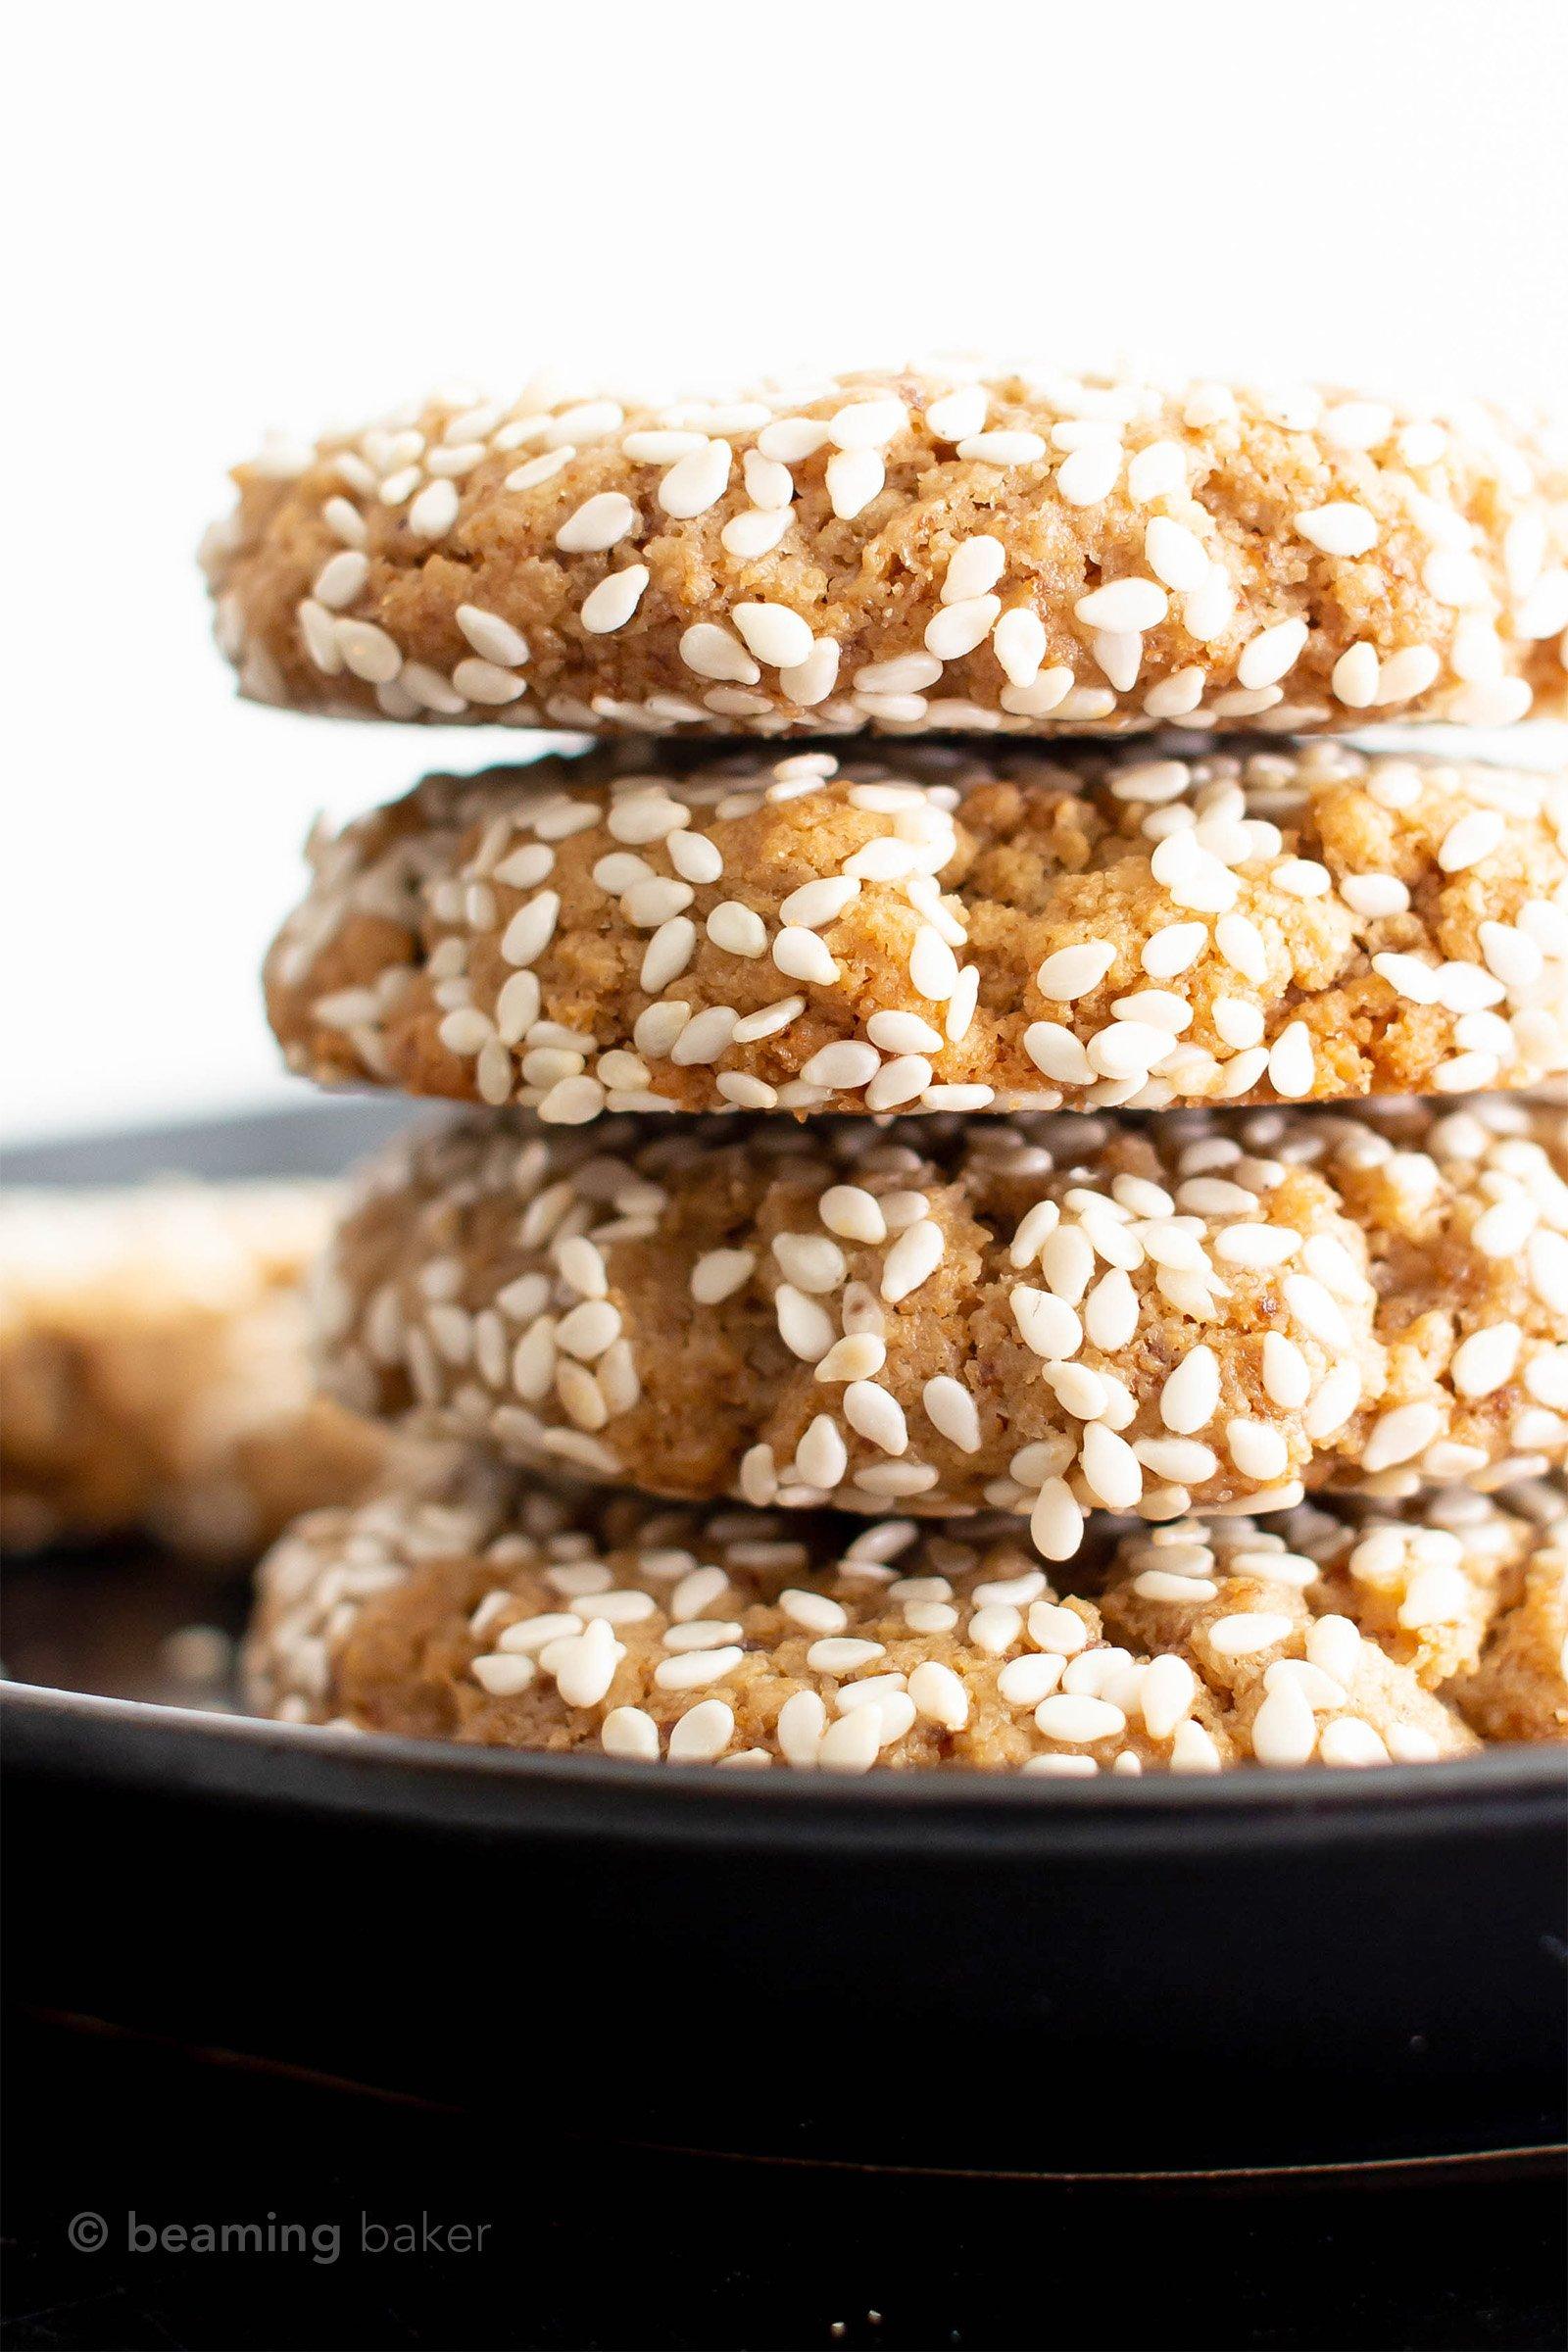 Vegan Sesame Tahini Cookies (Gluten Free): just 7 ingredients for the best vegan tahini cookies—buttery-rich, crisp sesame coating, tender on the inside. Delicious sesame tahini cookies that are gluten free! #Vegan #Sesame #Tahini #GlutenFree #Cookies | Recipe at BeamingBaker.com